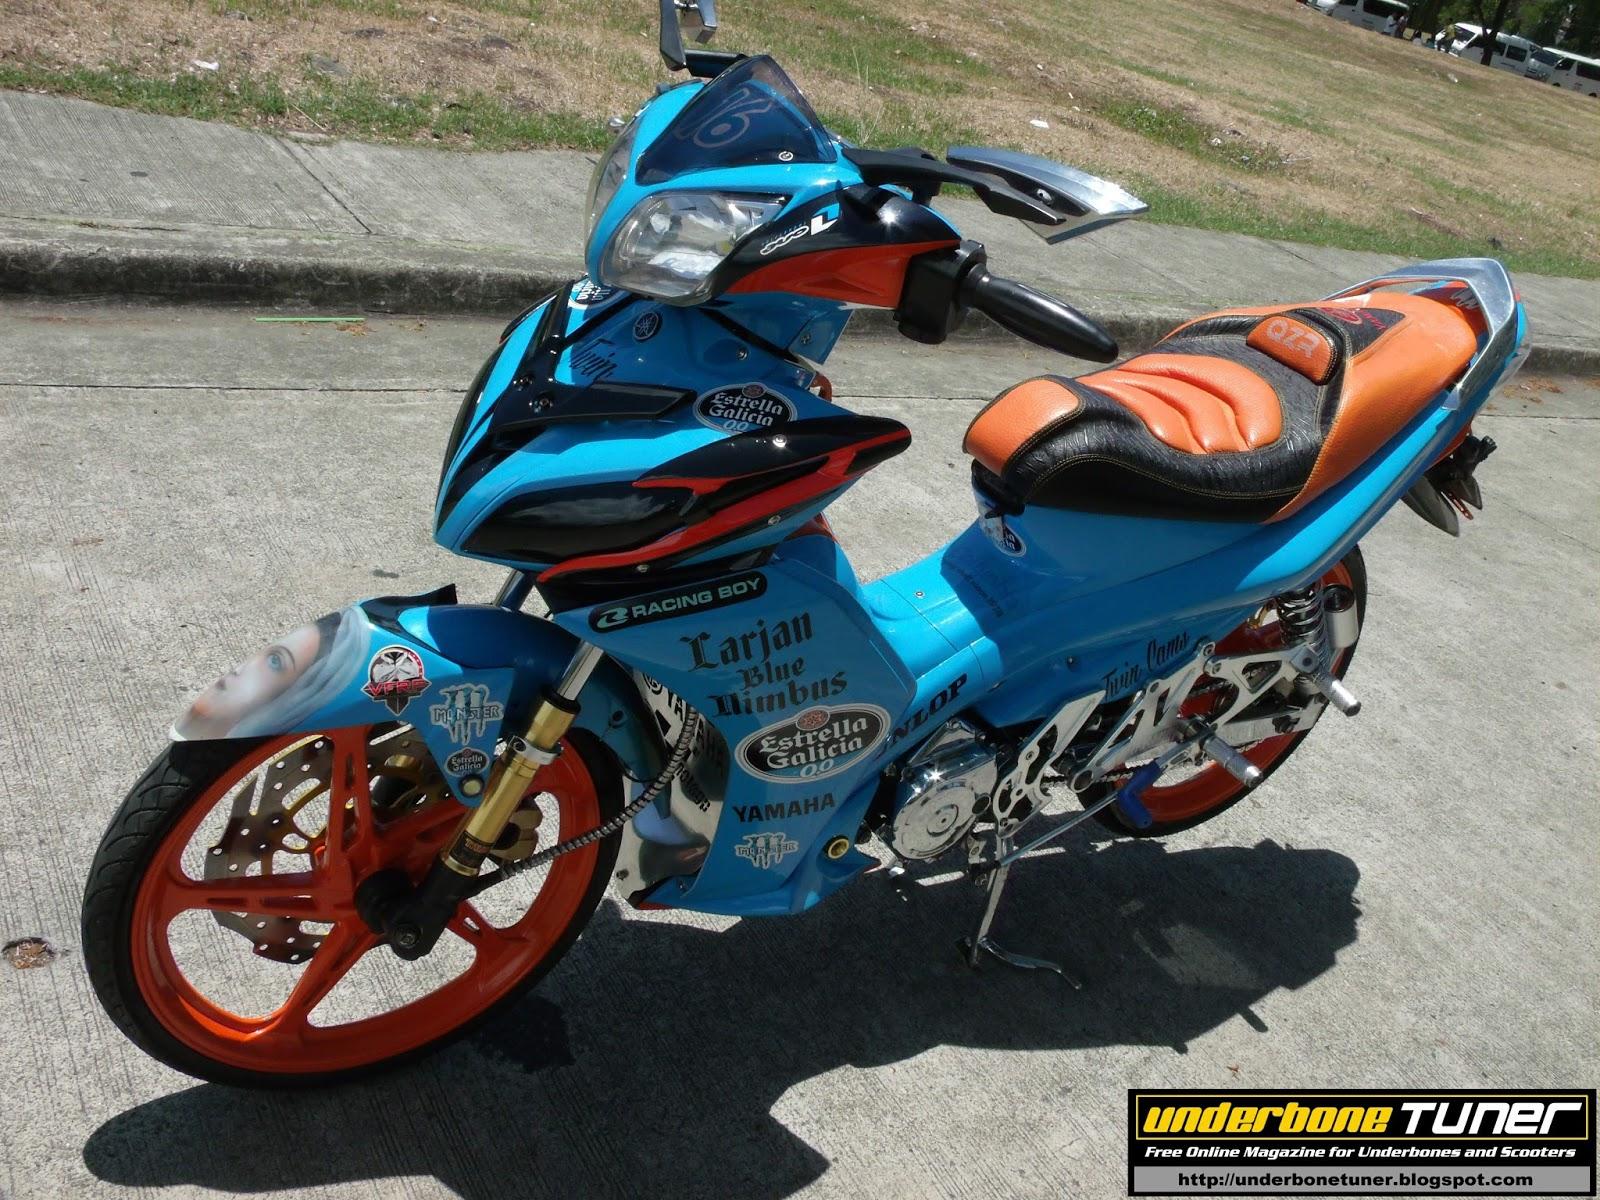 Underbone Tuner: Estrella Galicia MotoGP Inspired Yamaha